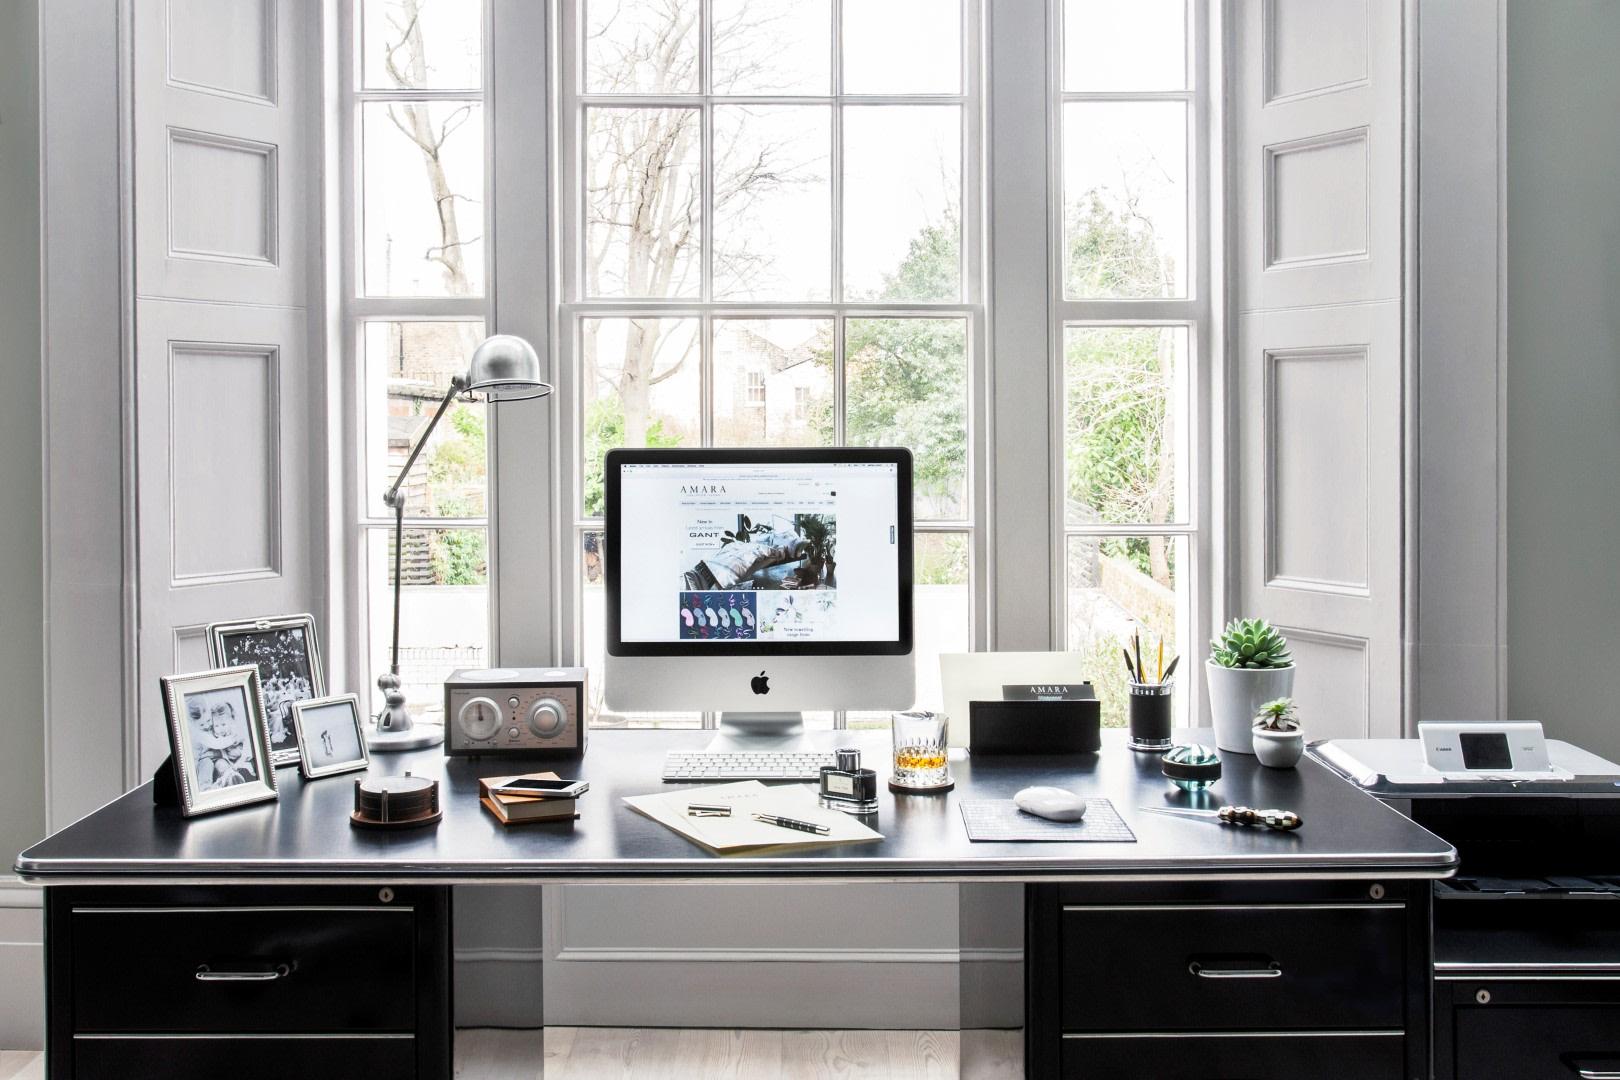 Home office with natural light | Source: amara.com